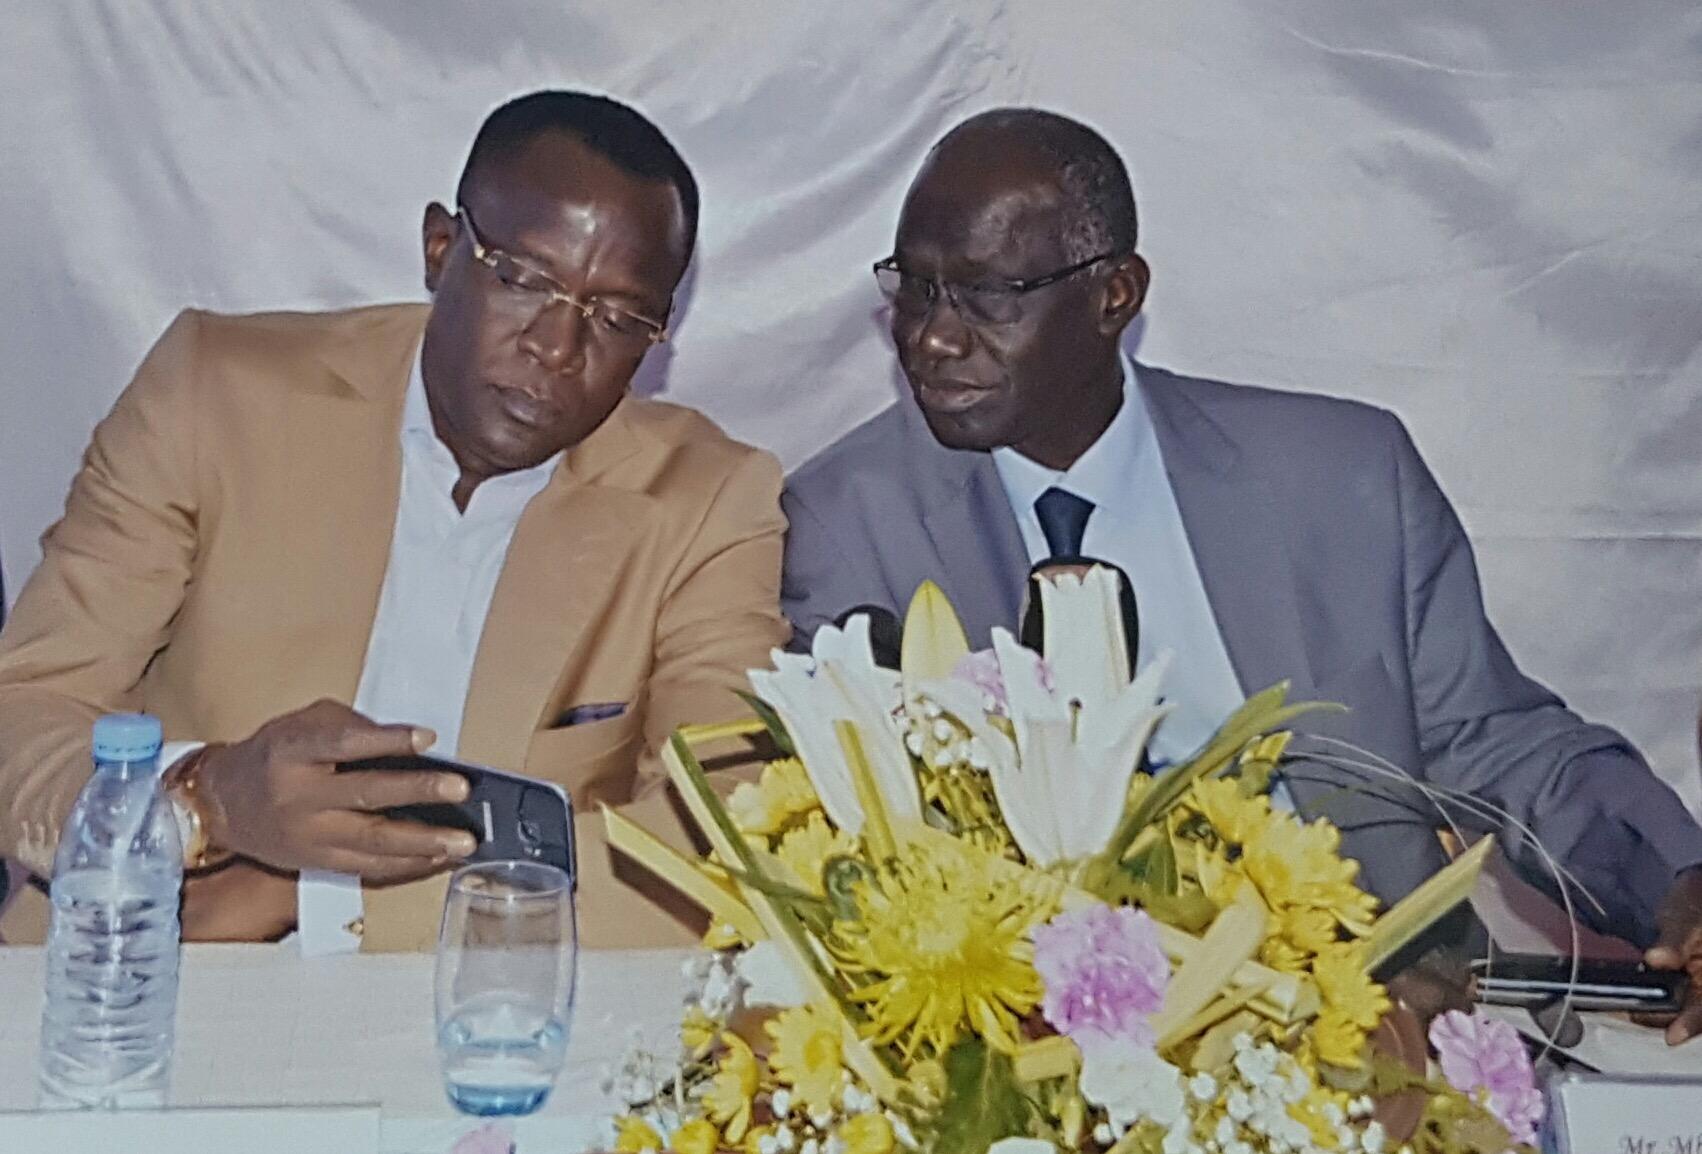 Mbagnick Ndiaye vide sa supposée opposition avec Yakham Mbaye